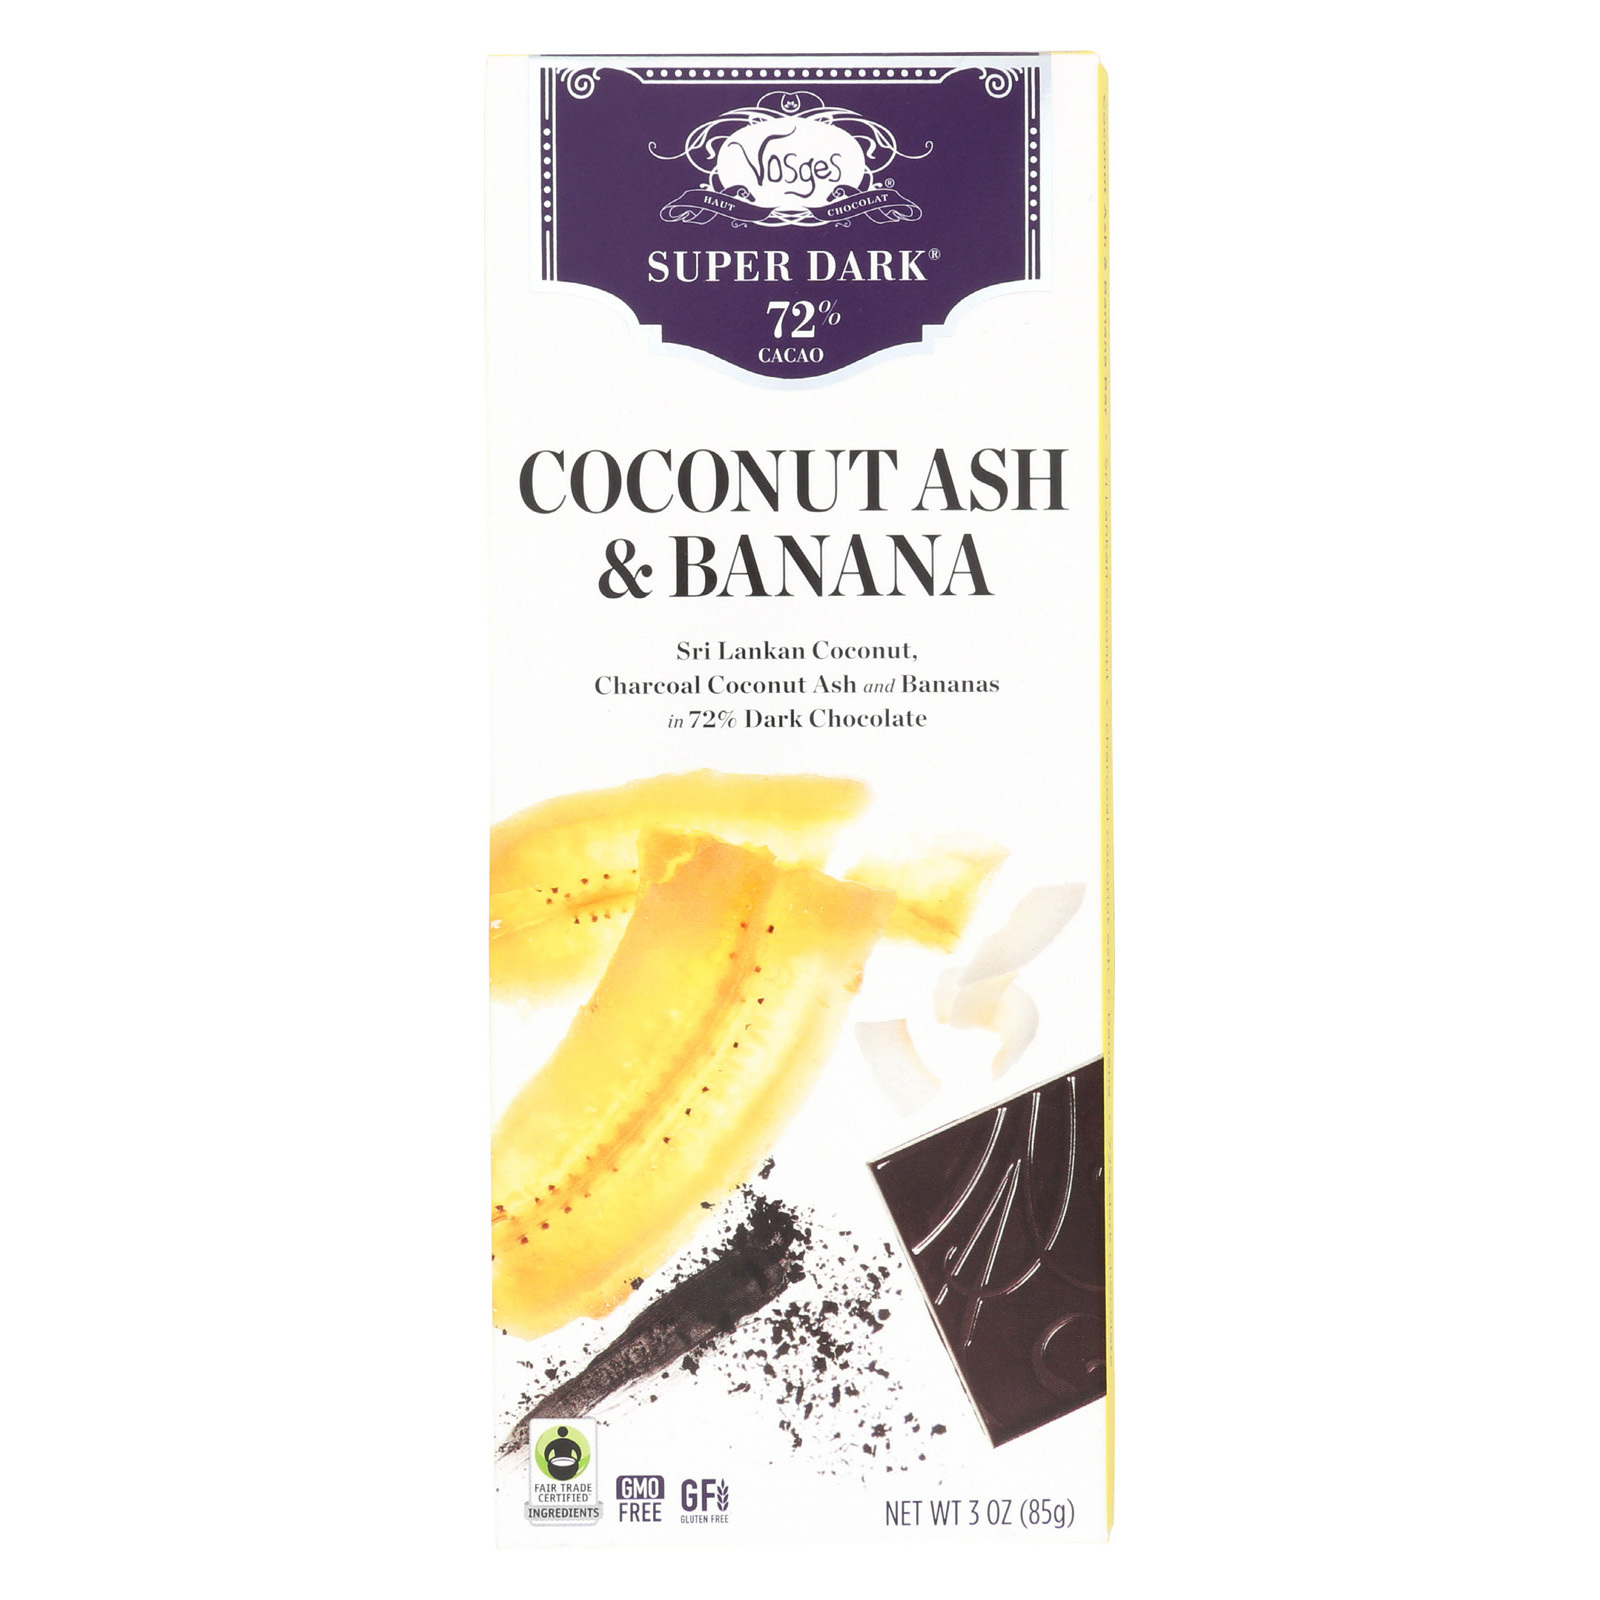 Vosges Haut-Chocolat 72% Cacao Super Dark Chocolate Bar - Coconut Ash & Banana - Case of 12 - 3 oz